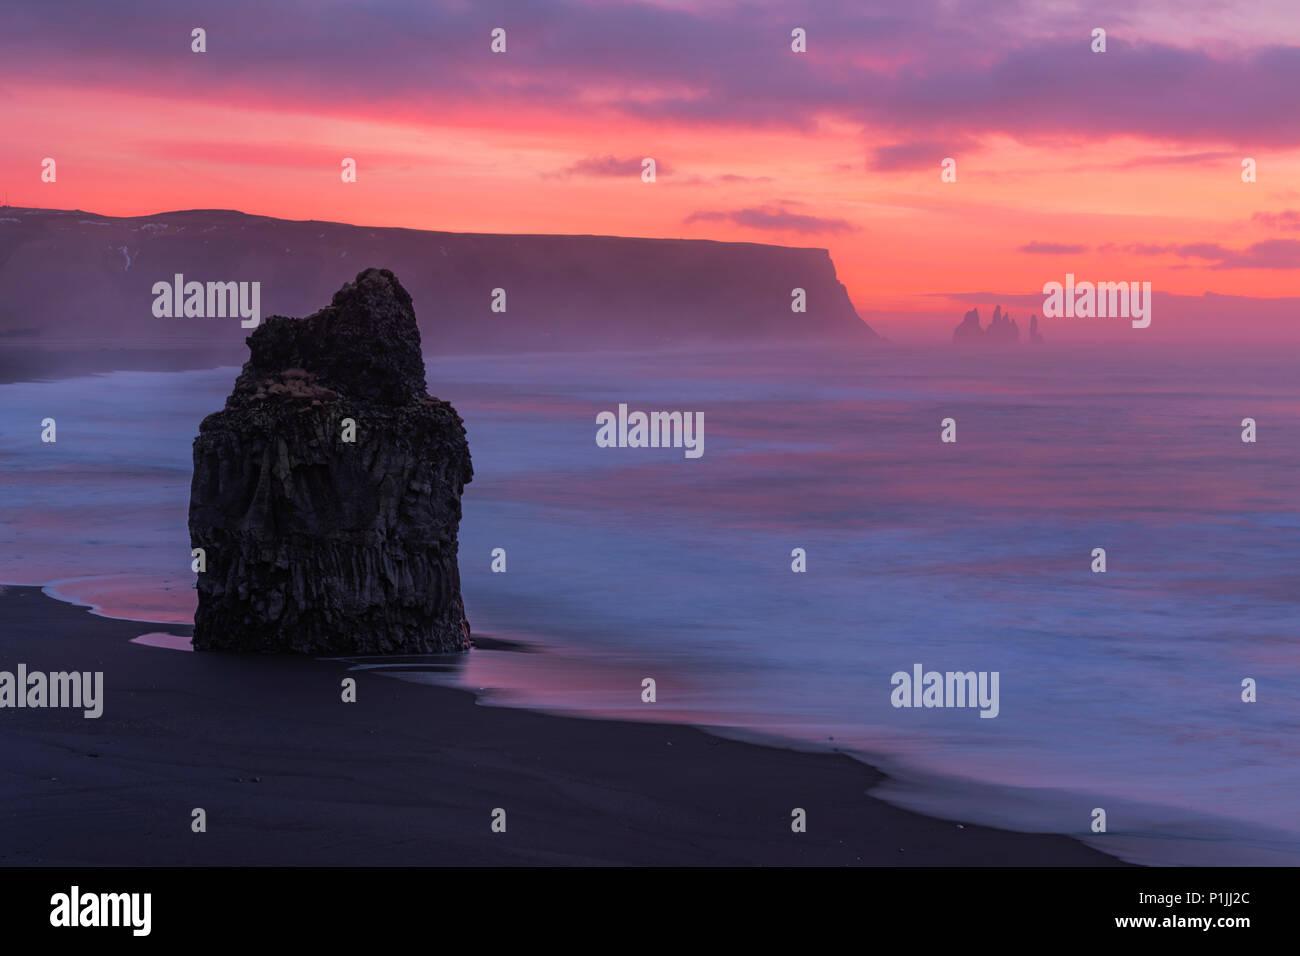 Dawn on the beach at Reynisfjara, Vik, Iceland - Stock Image